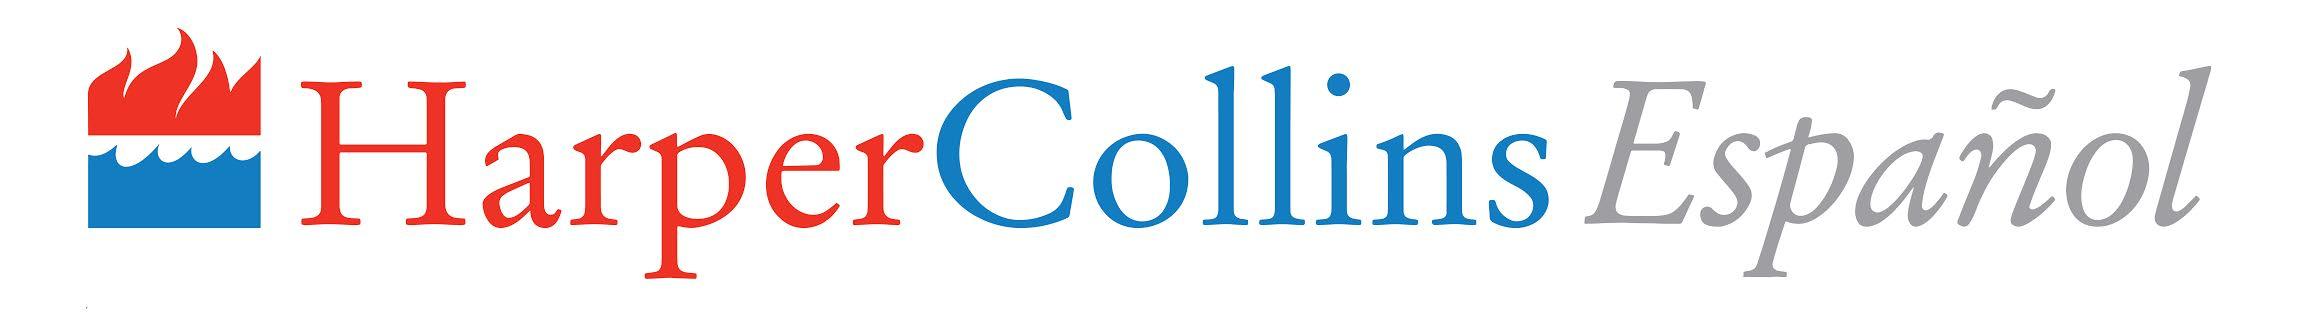 HarperCollins-logo-HCE.jpg